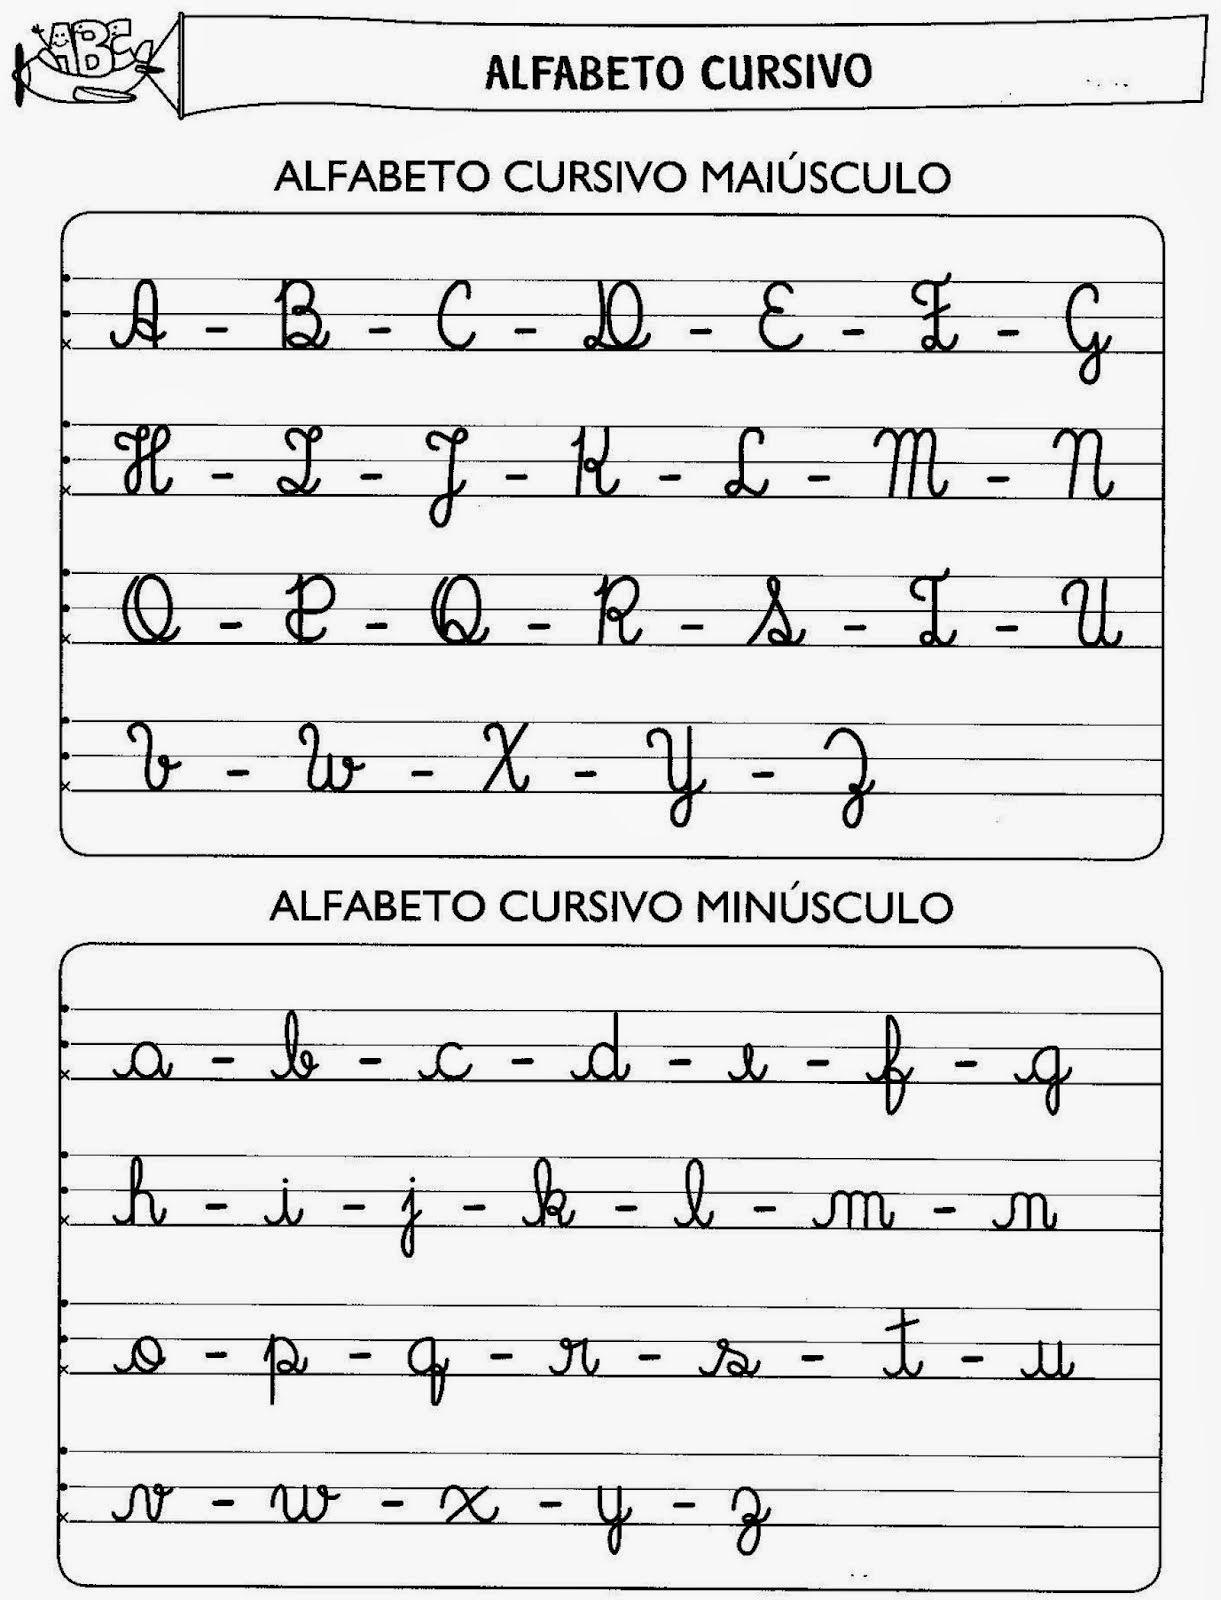 Alfabeto Cursivo Maiúsculo e Minúsculo para Imprimir - QDB ...